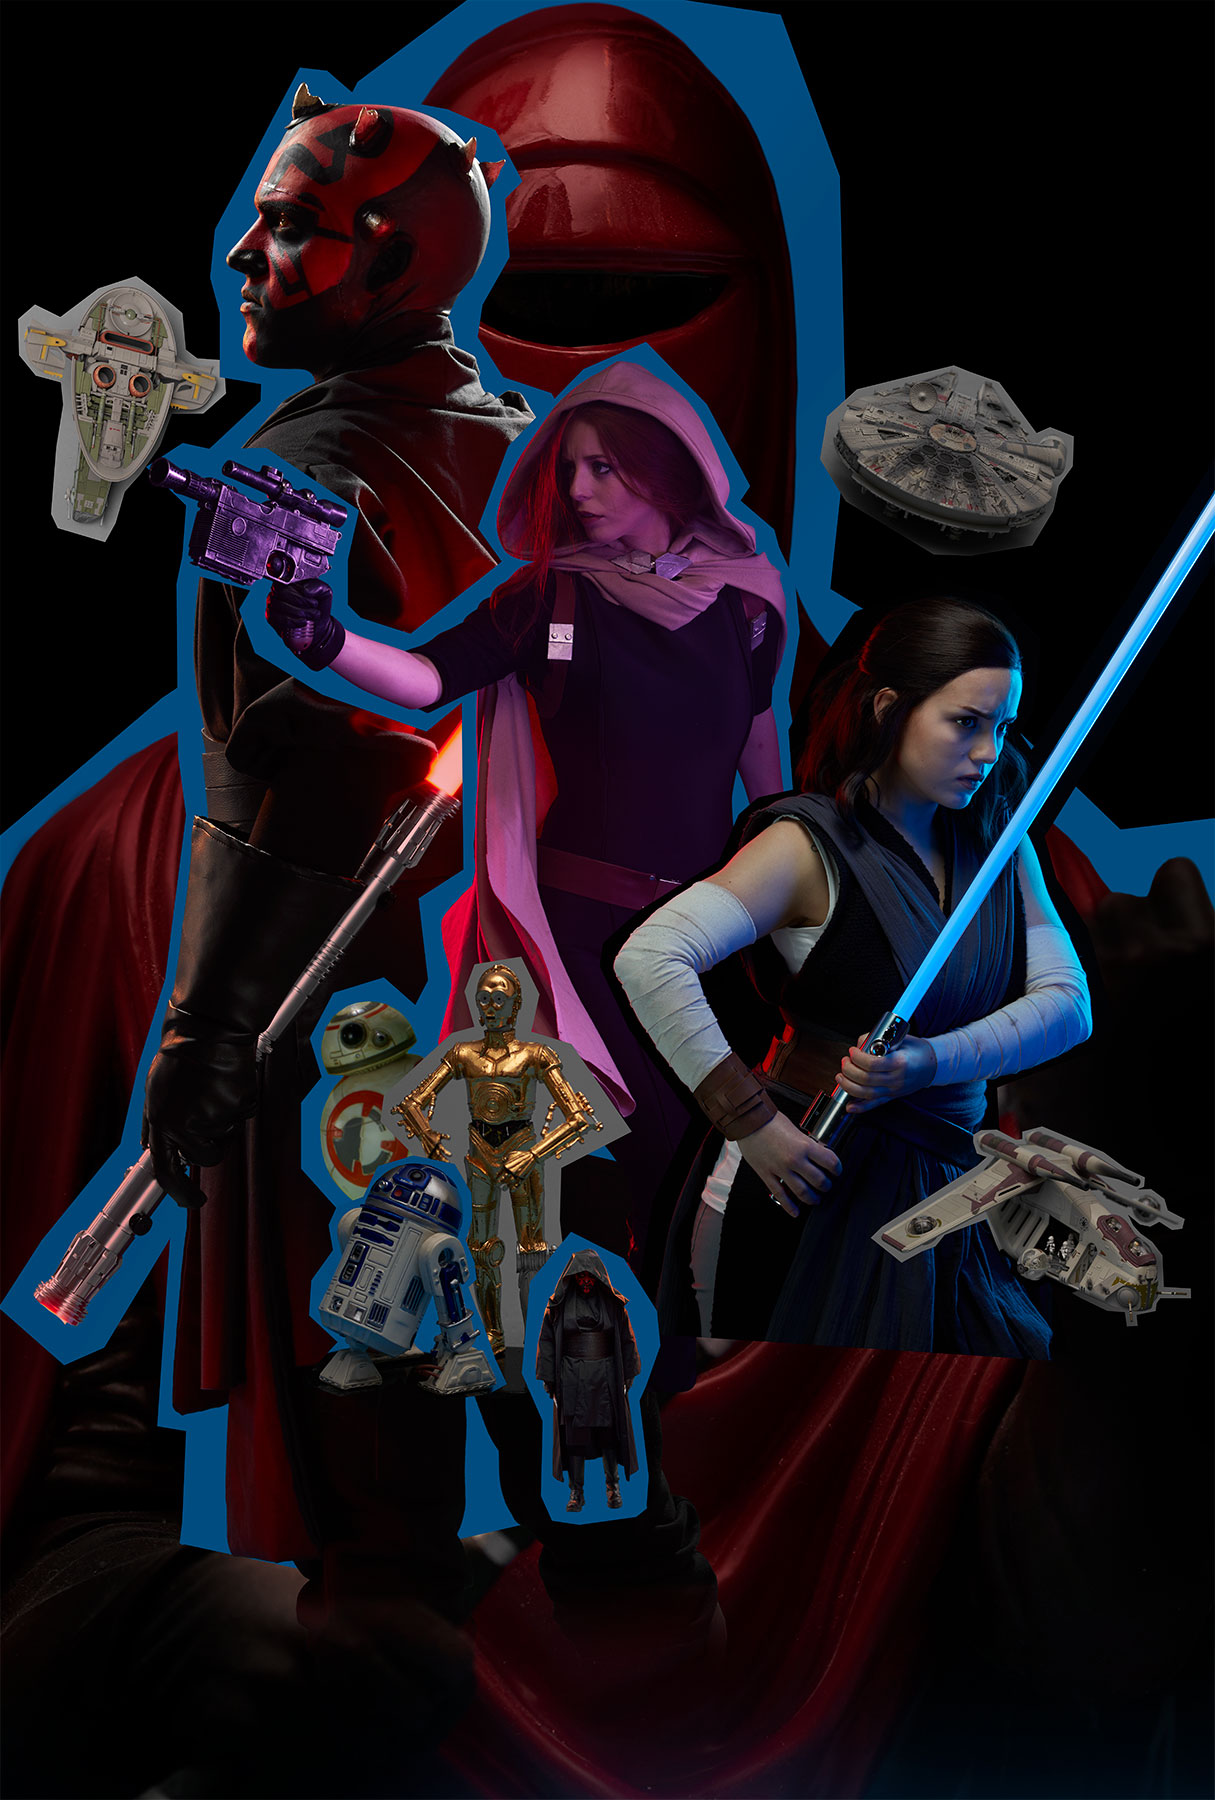 Sayanoff Arthur Star Wars Poster 02 01